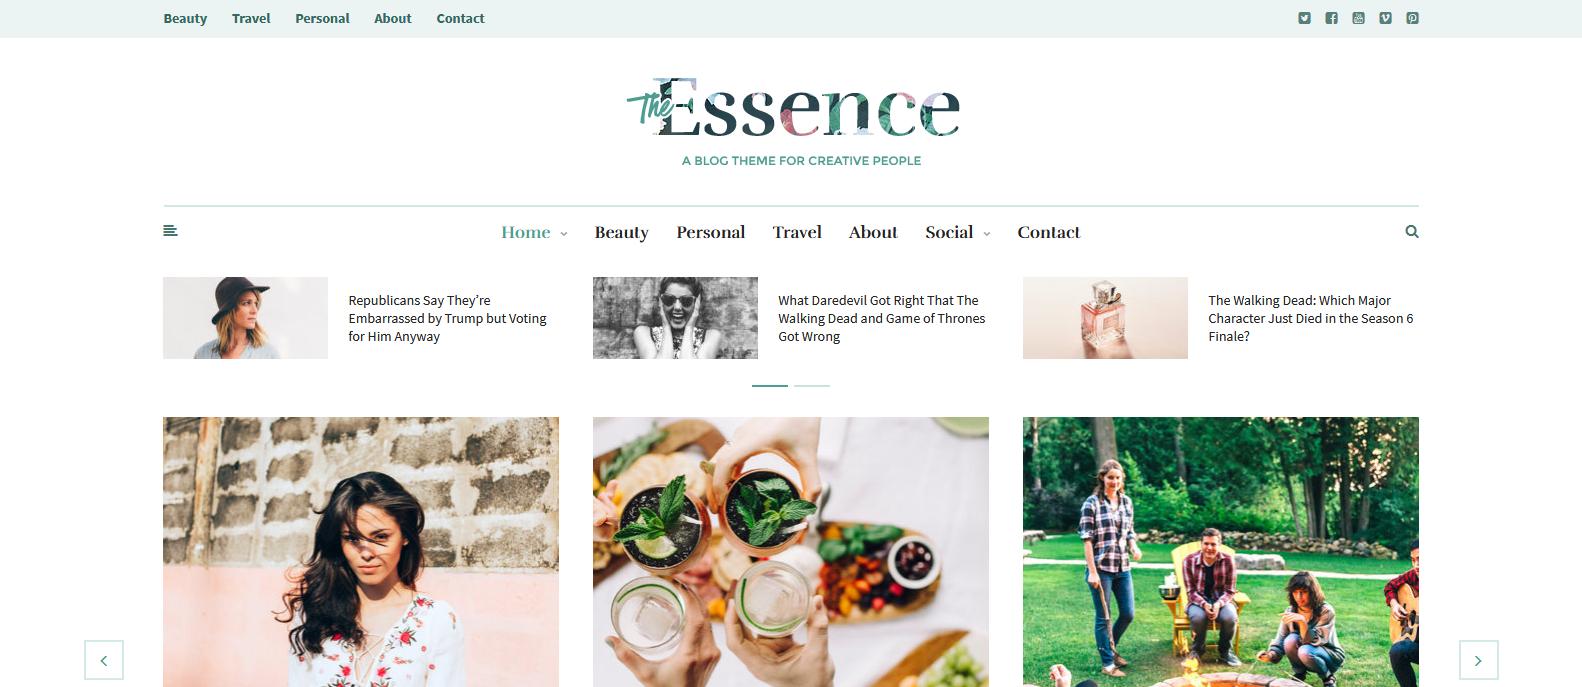 Демо-сайт с темой The Essence